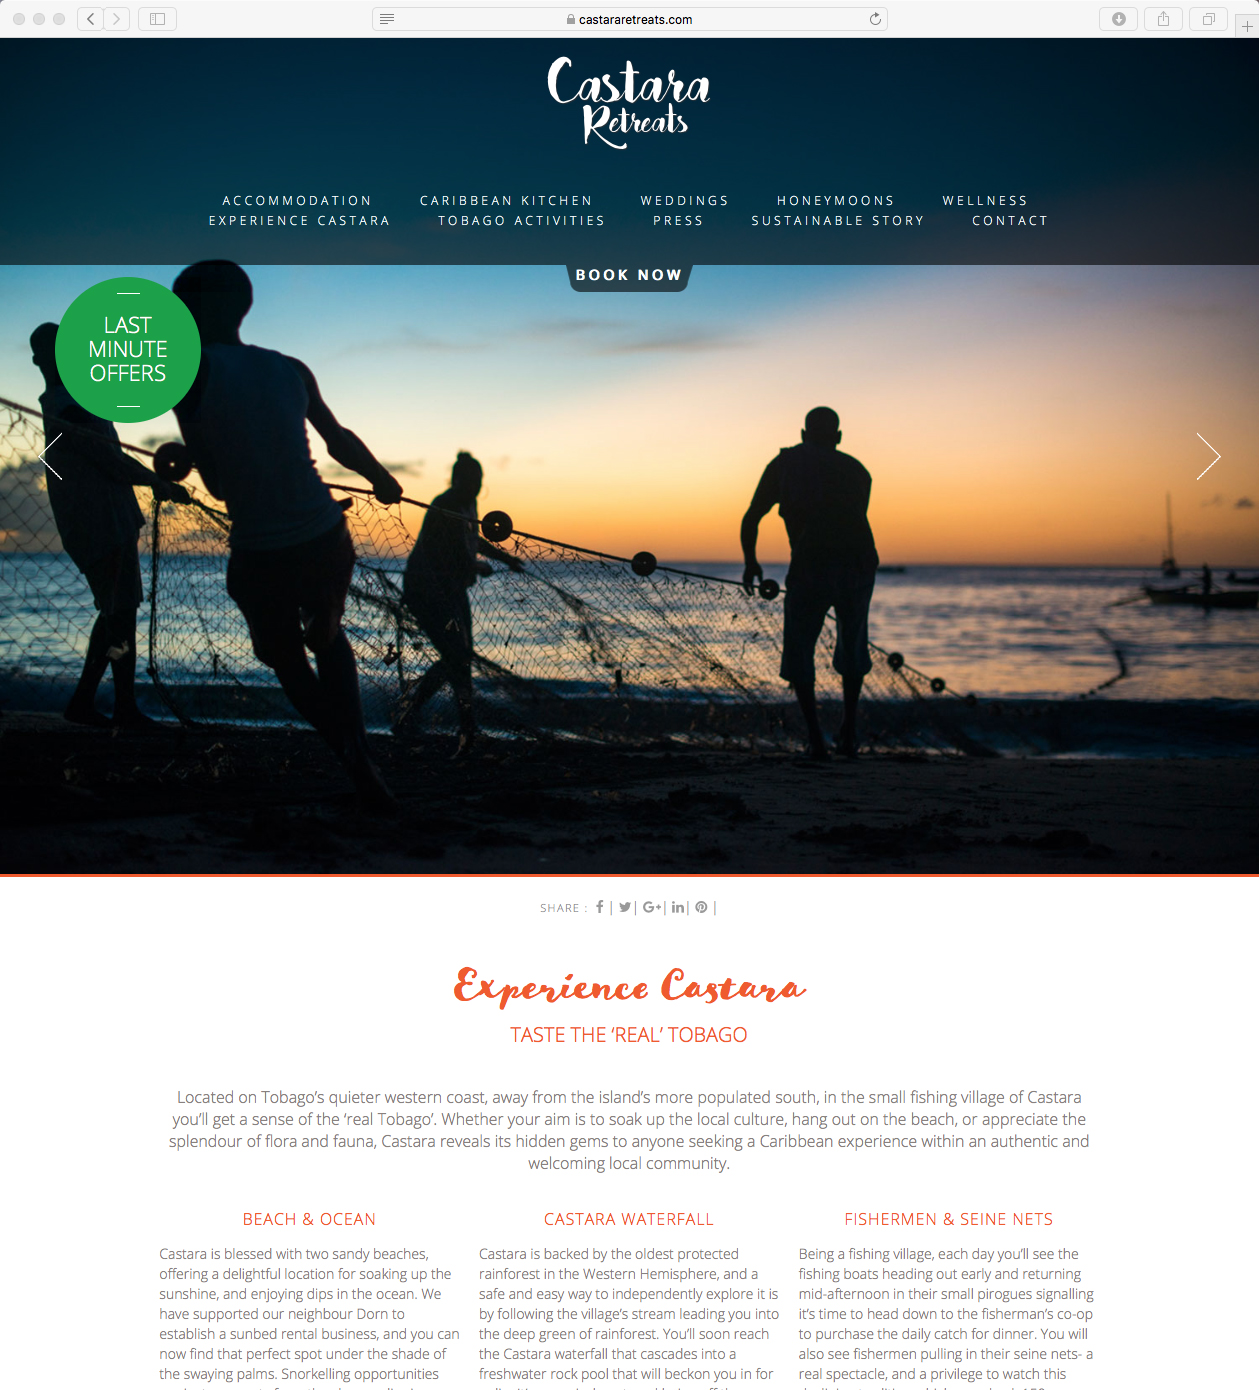 Castara Retreats website